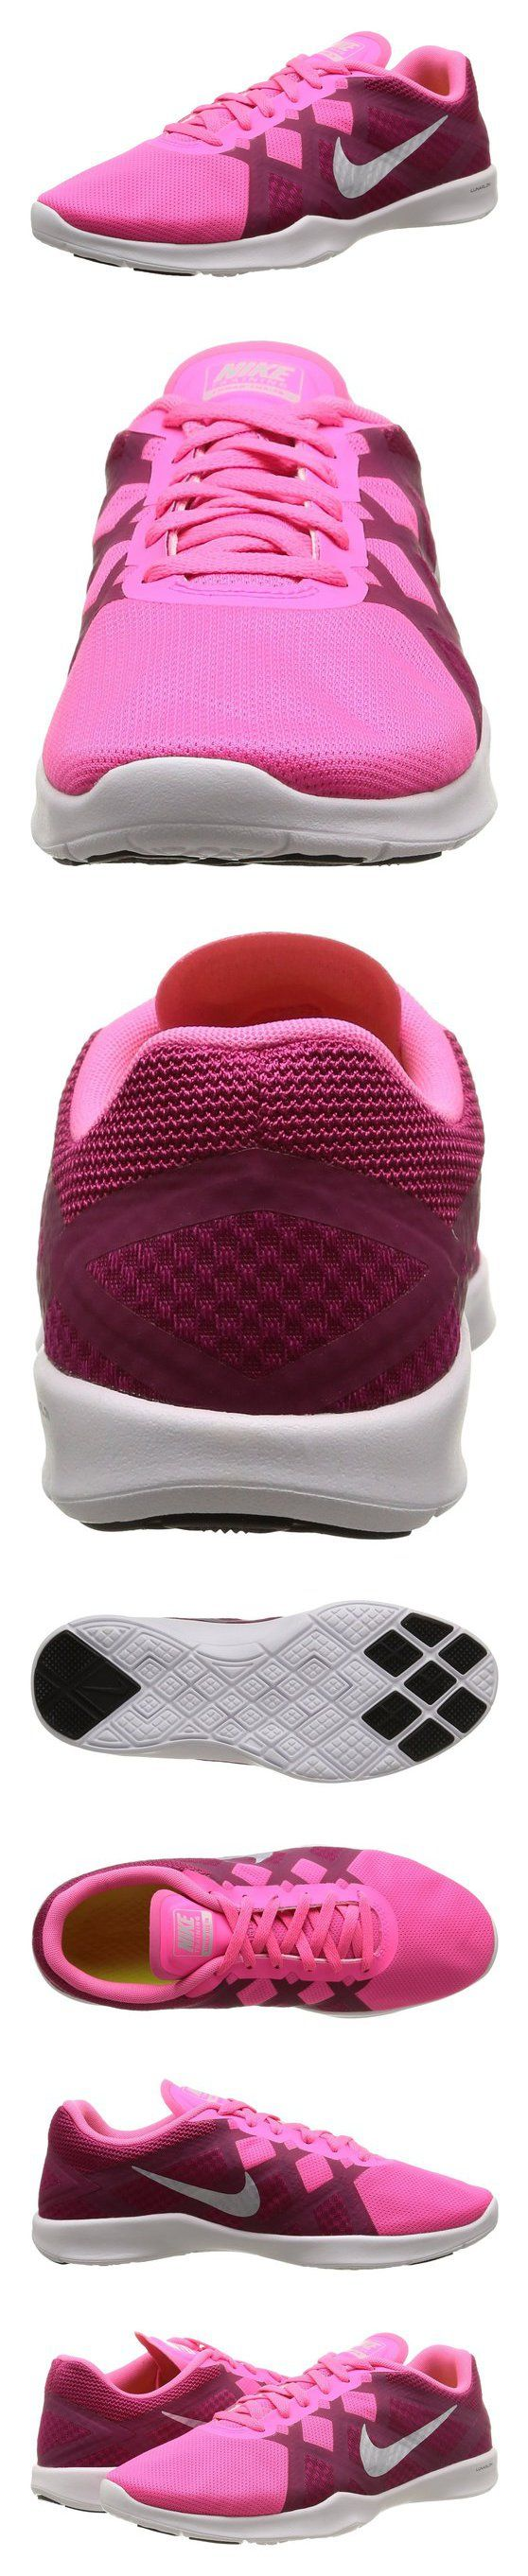 $58 - Women\u0027s Nike Lunar Lux TR Training Shoe Pink Pow/Sport Fuchsia/White